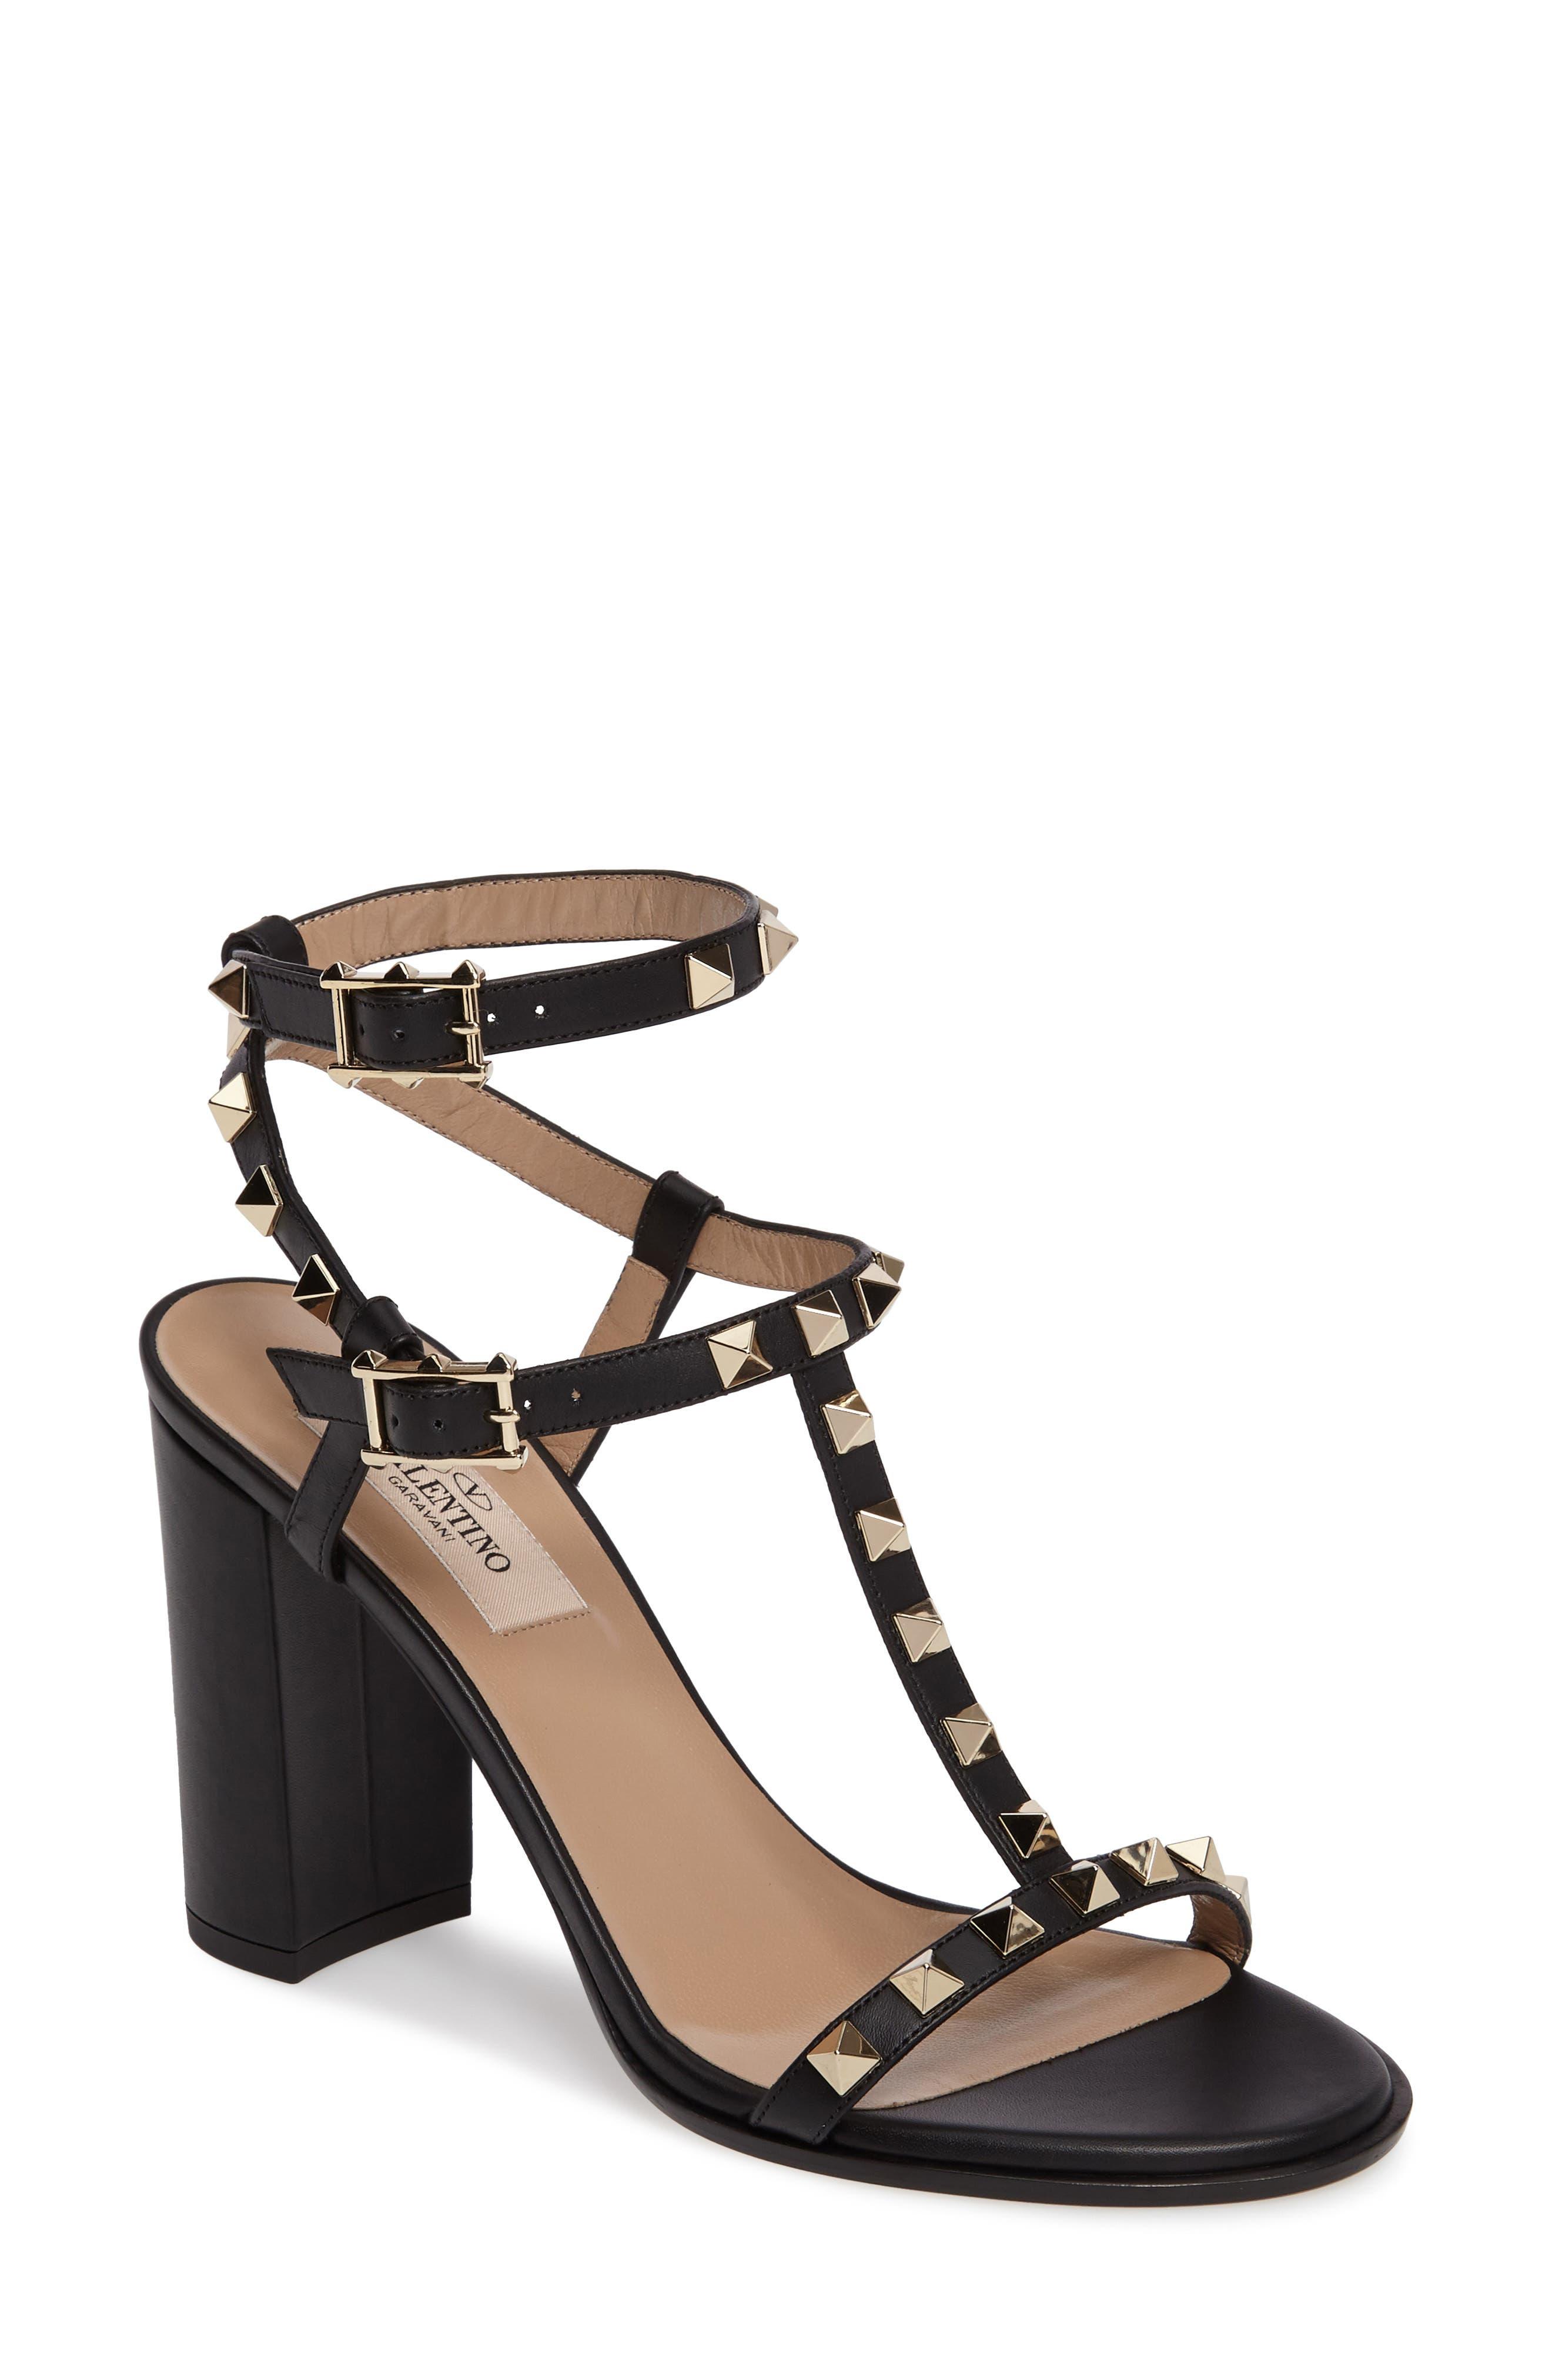 Alternate Image 1 Selected - Valentino Rockstud Ankle Strap Sandal (Women)